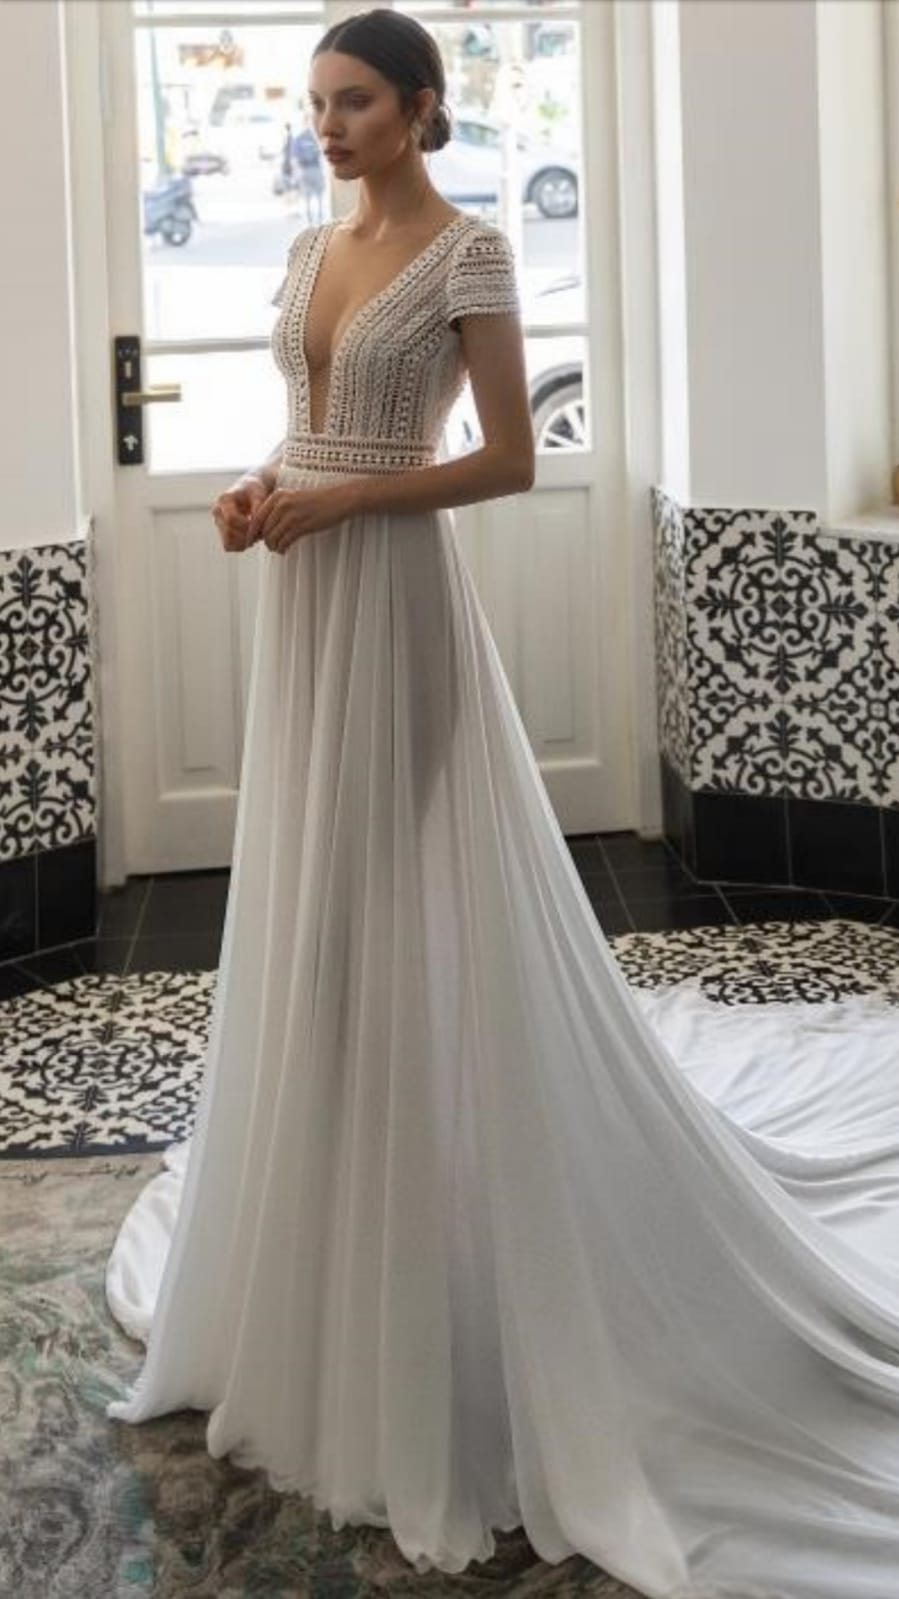 Julie-Vino-sposa-2020-1